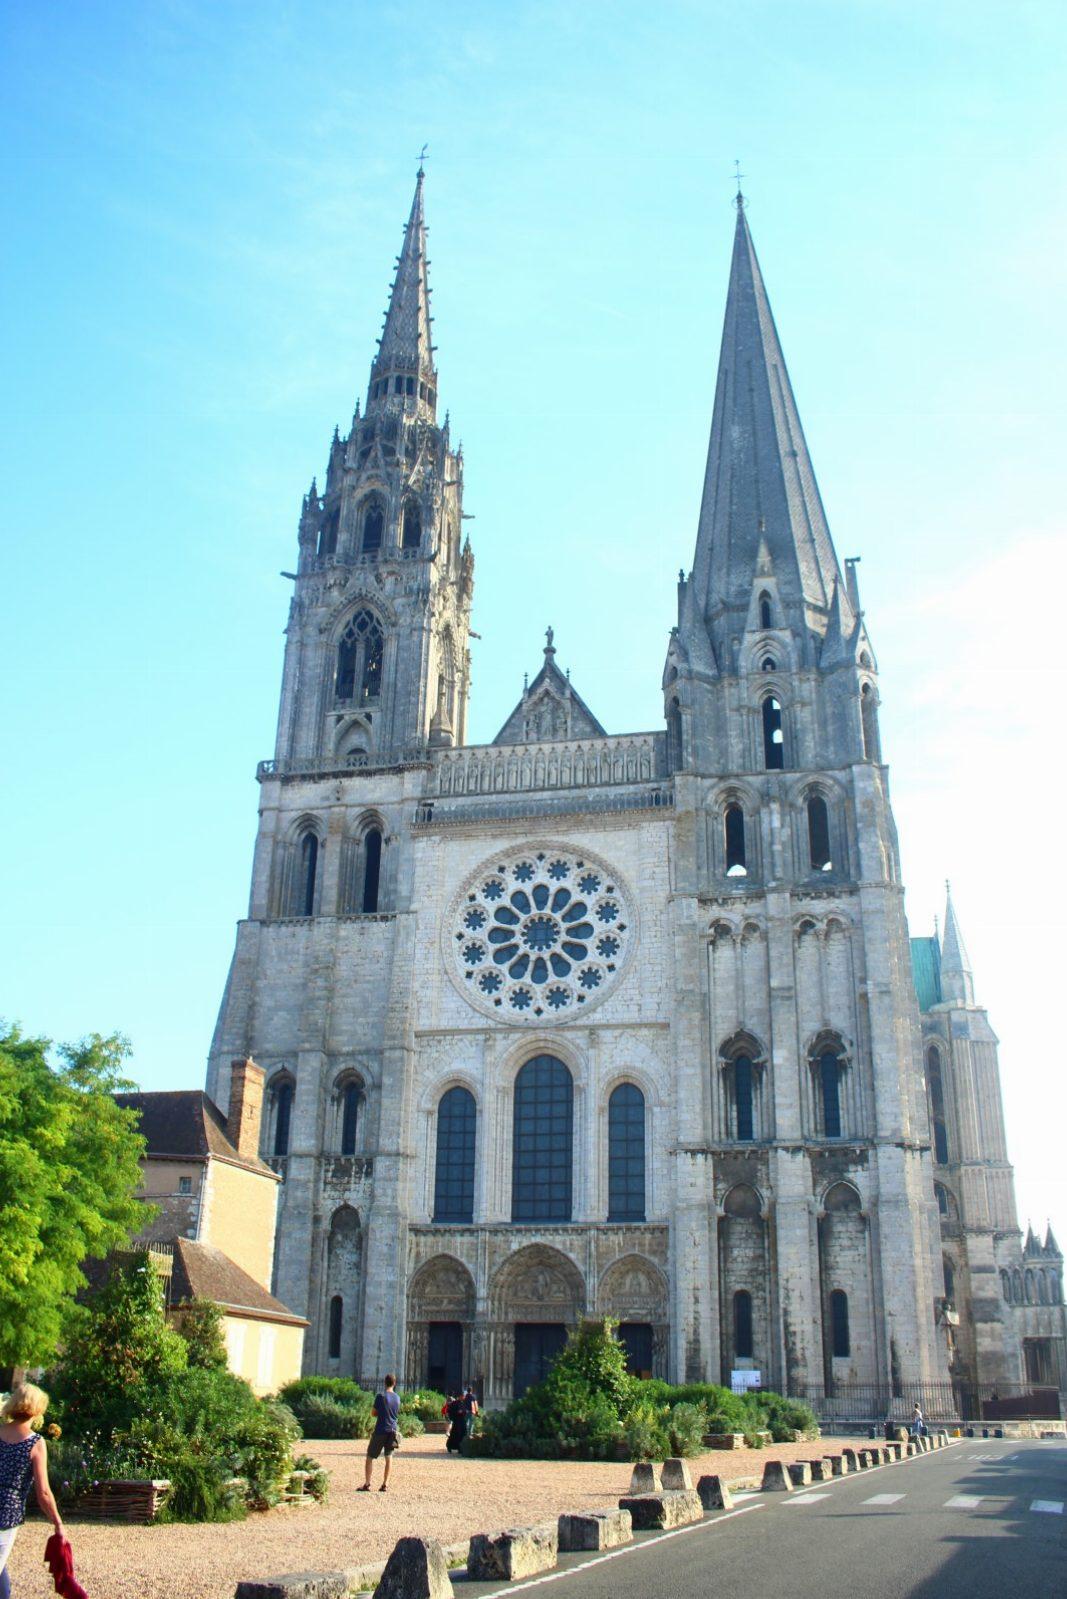 Catedral de Chartres (a las afueras de Paris)